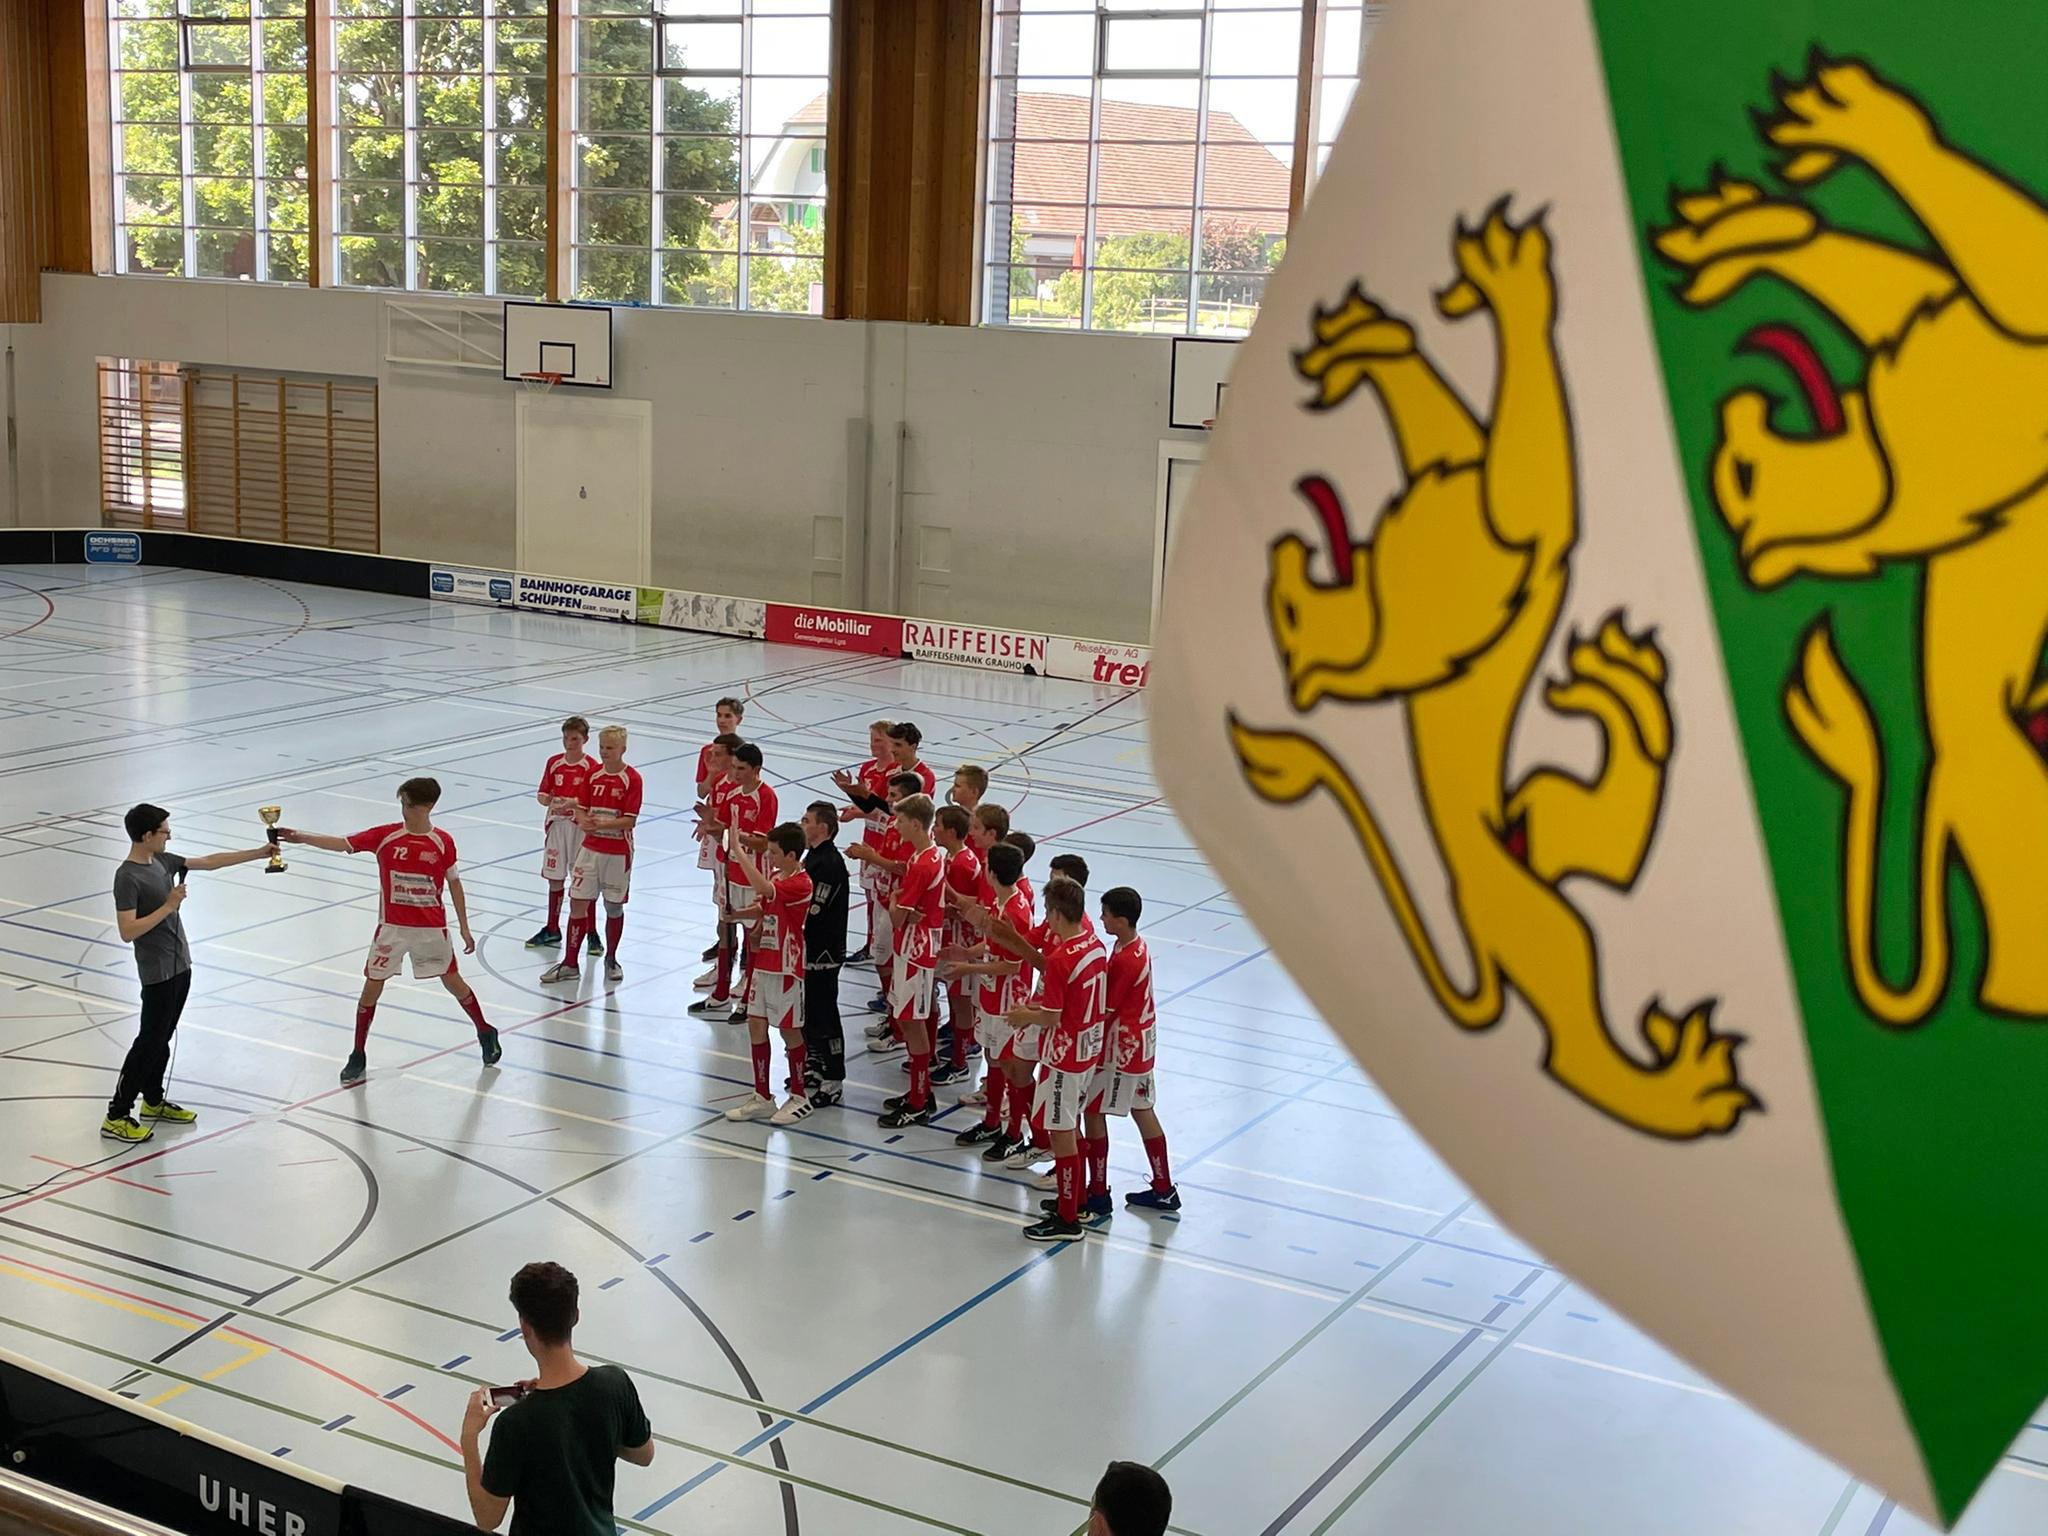 Coronaconforme Pokalübergabe. Comeback-Cup-Sieger 2021: Das U16-Team der UH Red Lions Frauenfeld.